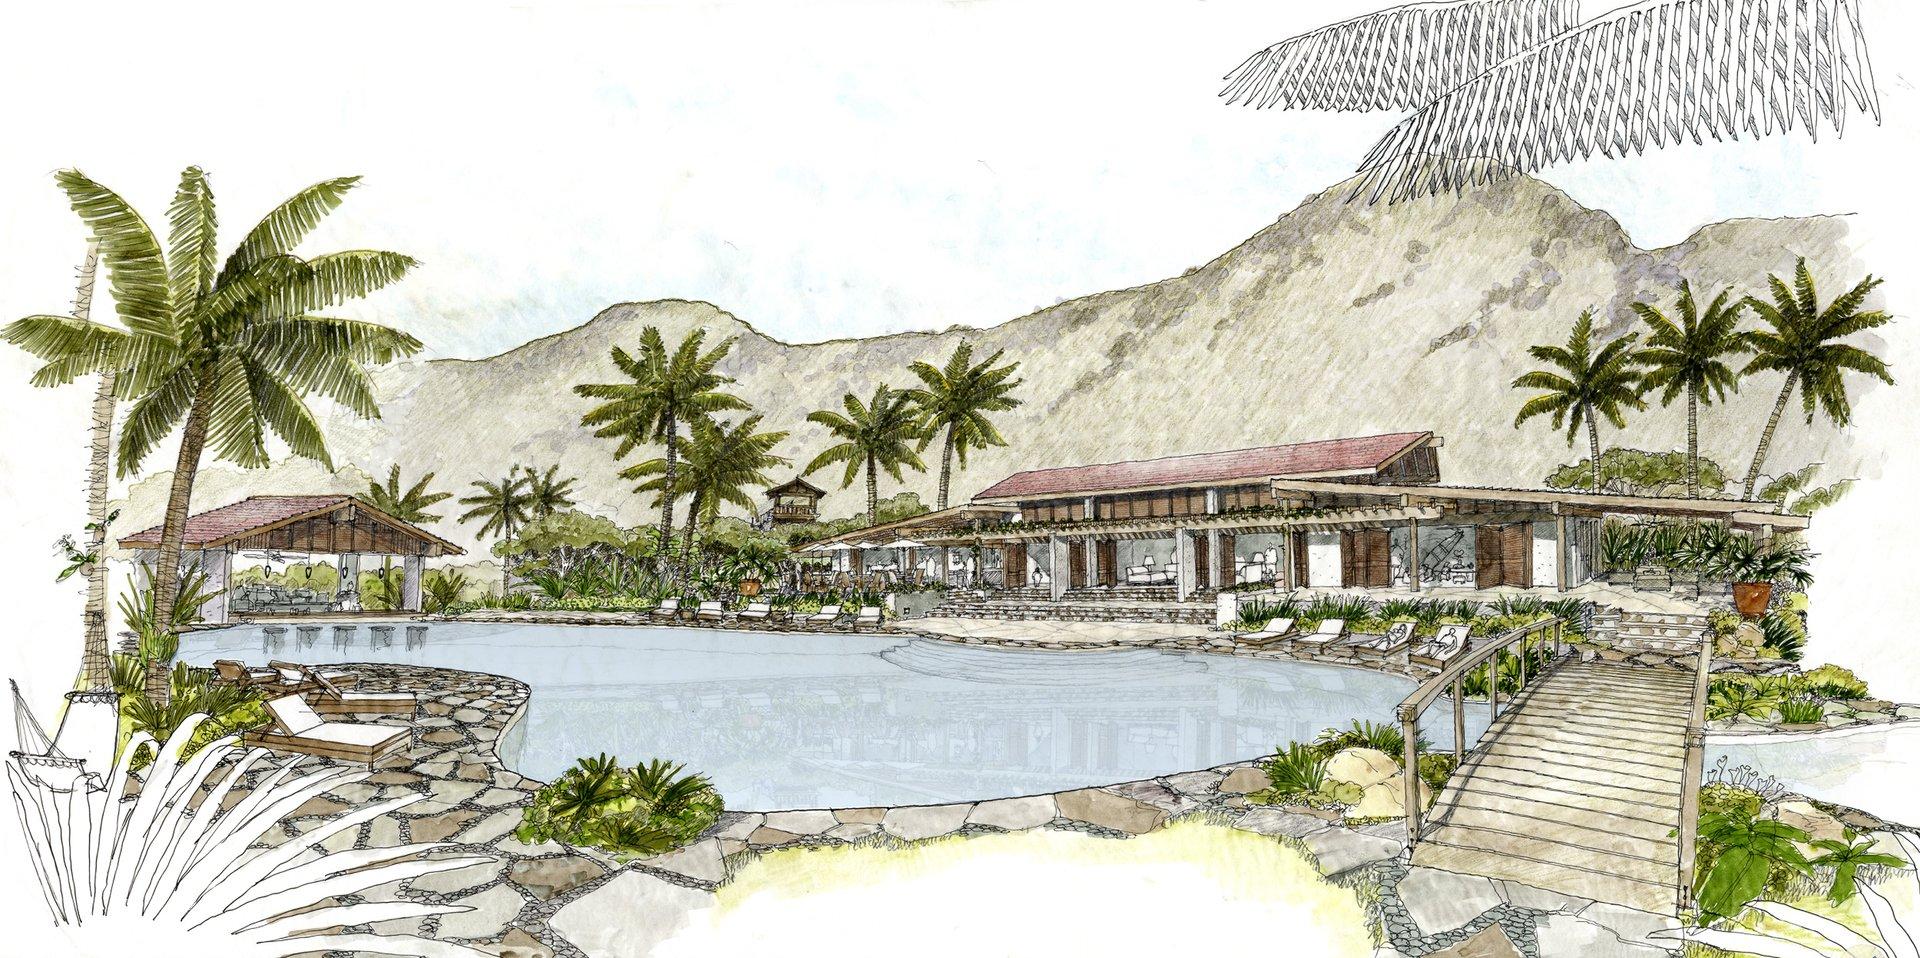 Costa_Rico_Eco_Surf_Resort_Hero@2x